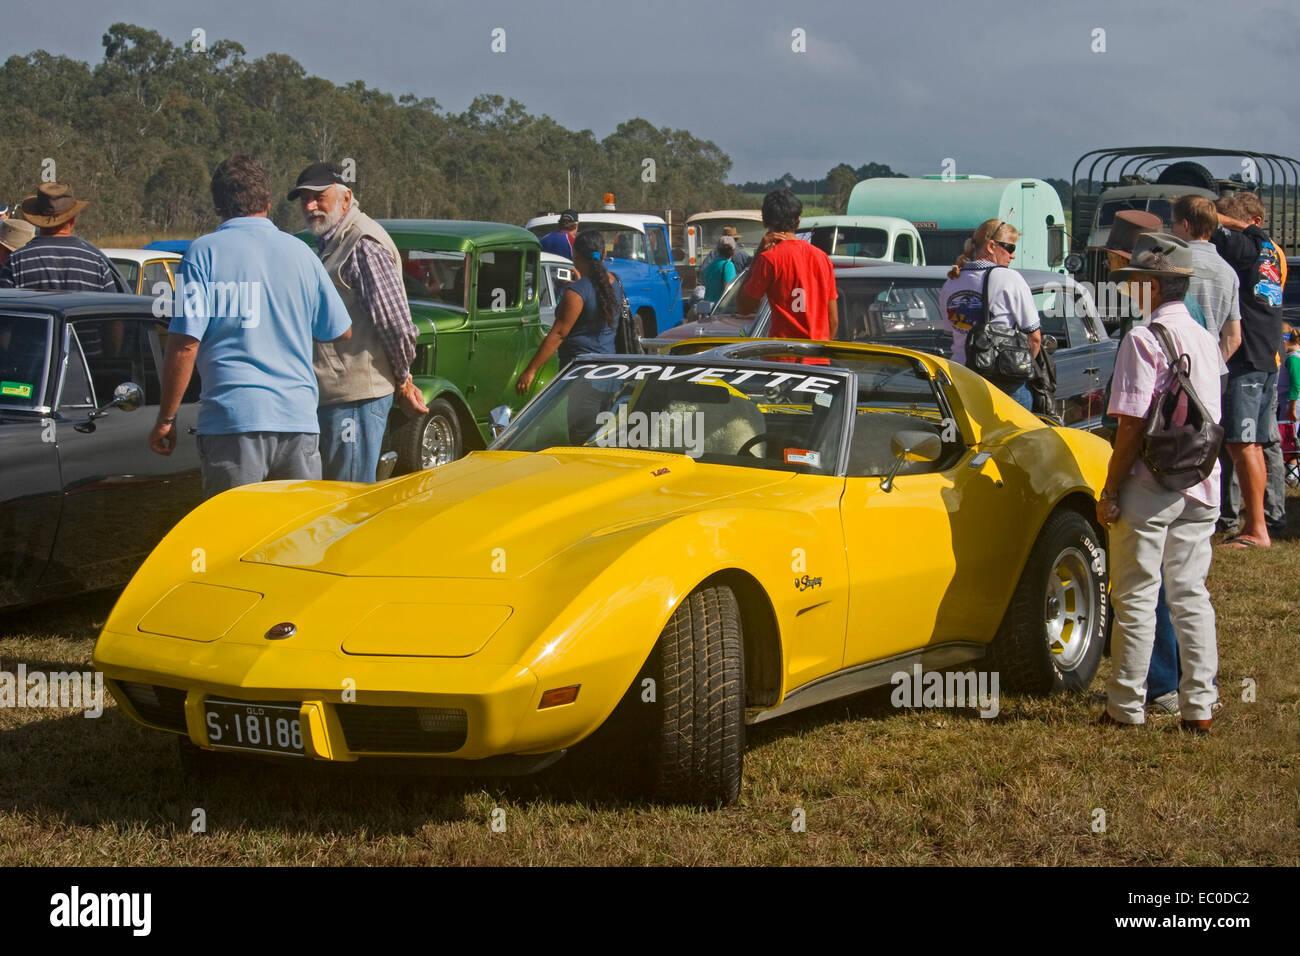 Bright Yellow Corvette Stingray Two Door Sports Car Coupe Stock